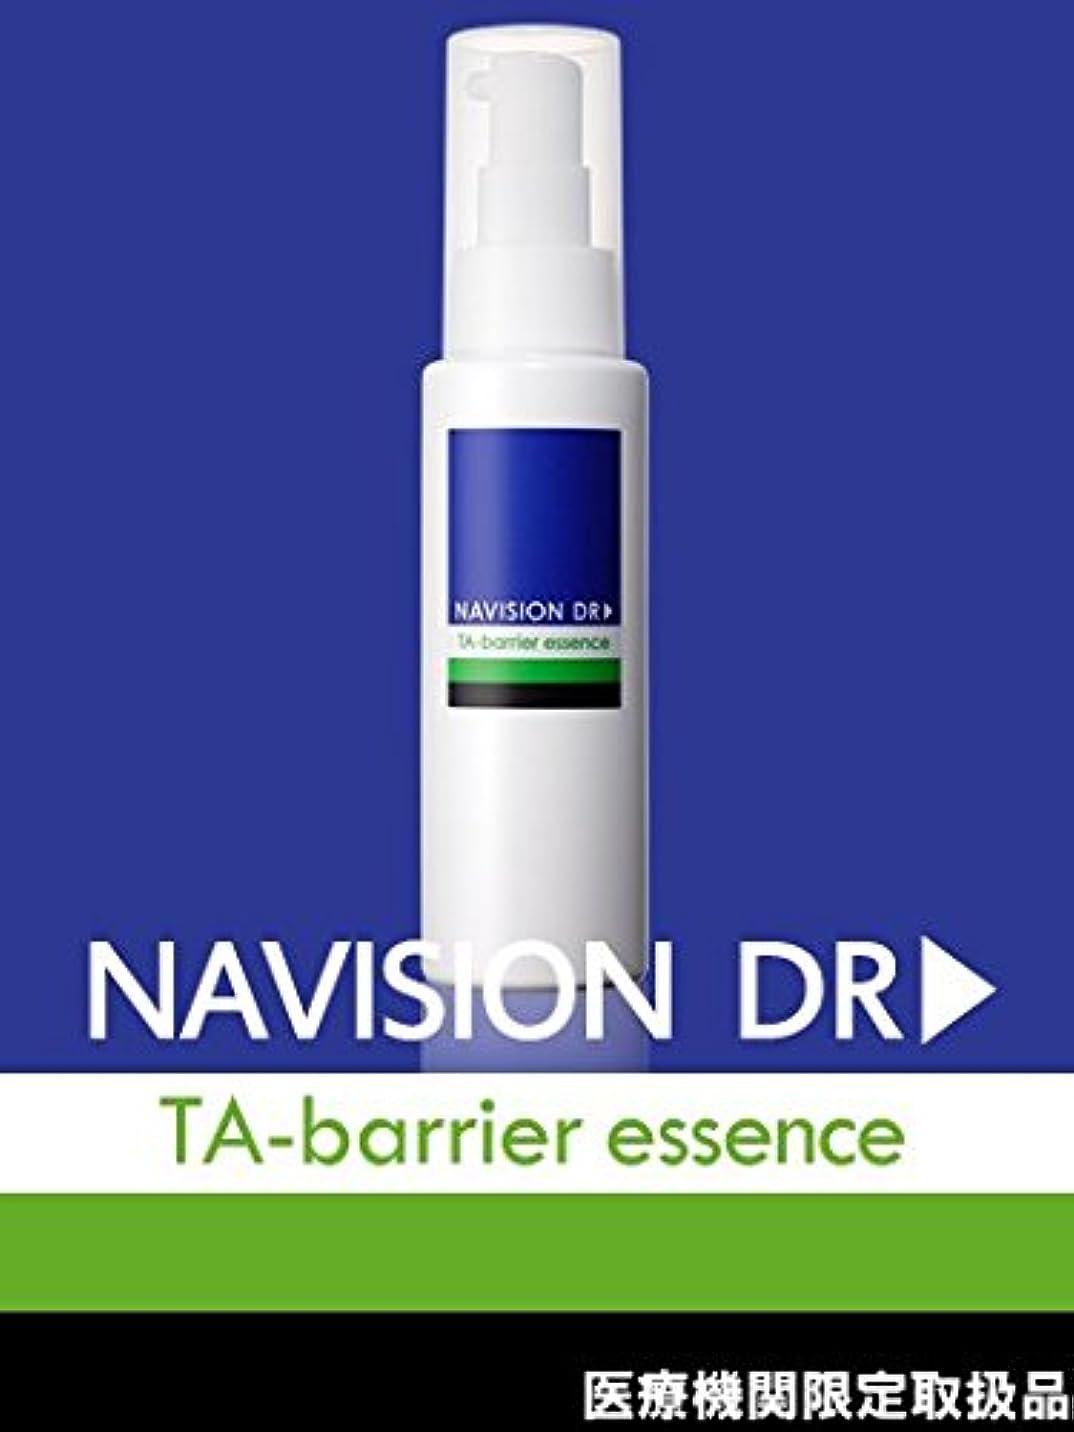 NAVISION DR? ナビジョンDR TAバリアエッセンス(医薬部外品) 80mL 【医療機関限定取扱品】